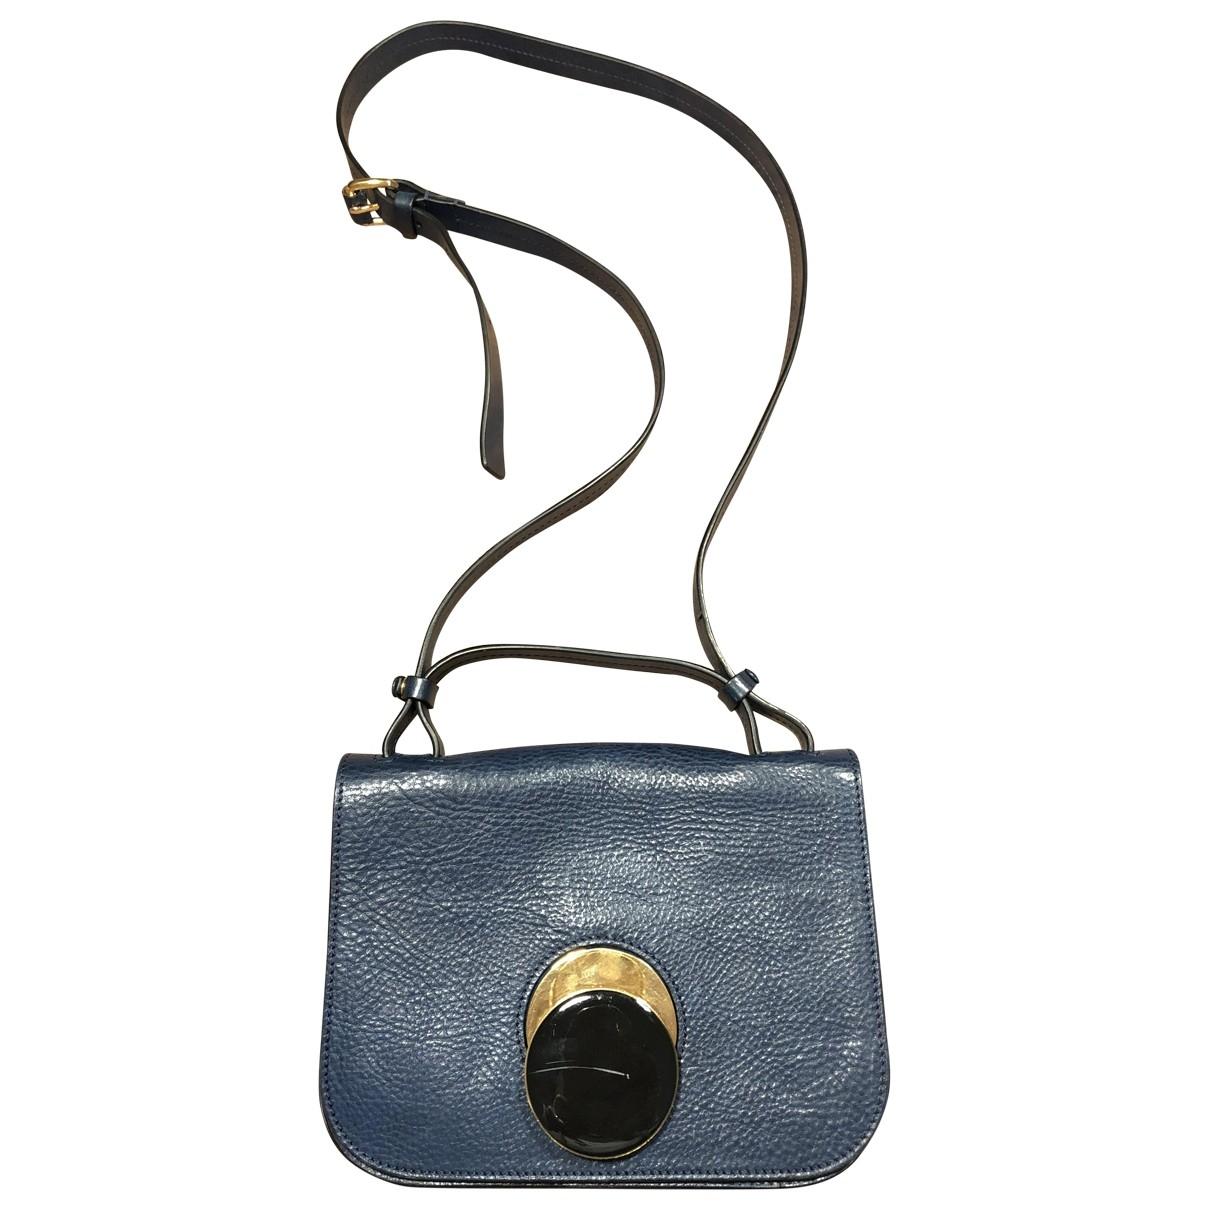 Marni \N Blue Leather handbag for Women \N